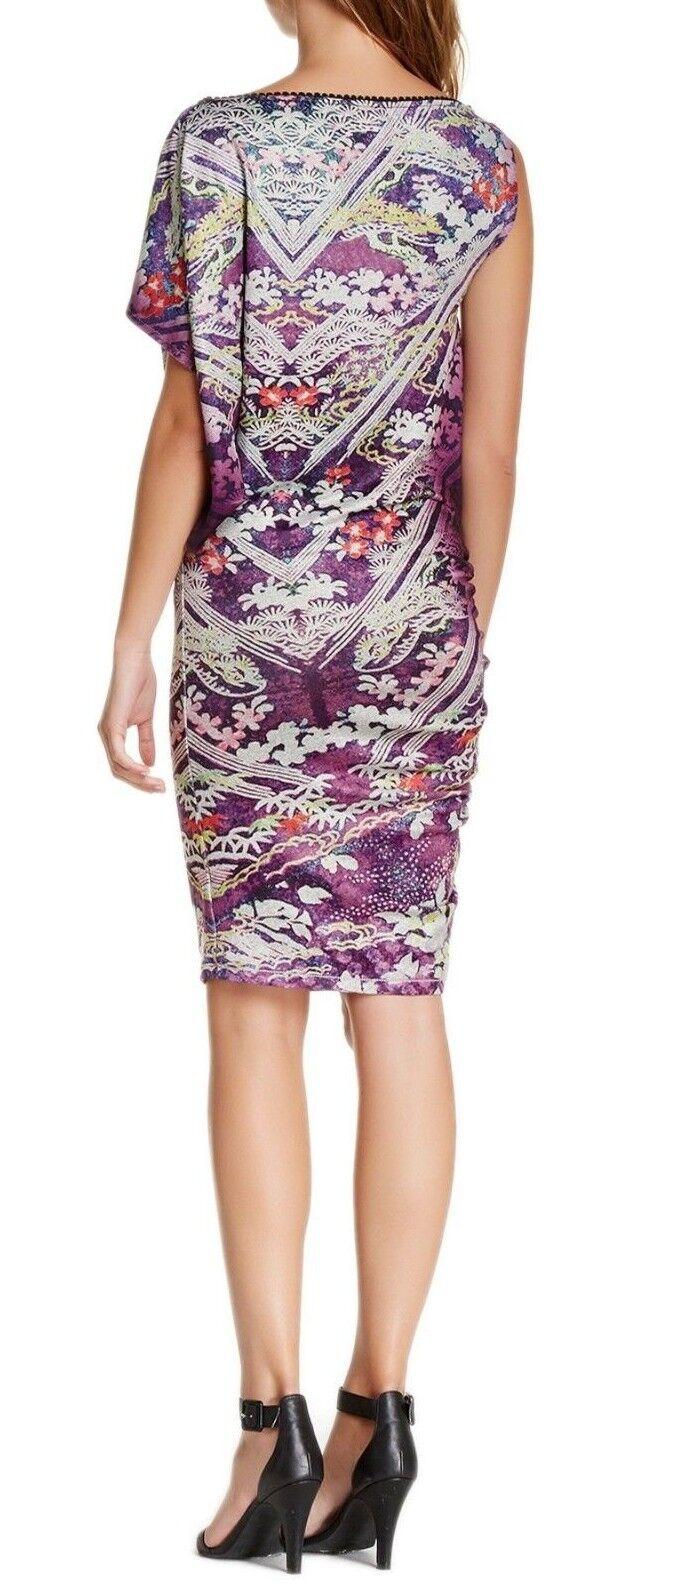 Custo Barcelona Habre Purple Purple Purple Dress Asymmetrical One Shoulder Kimono Sleeve S, M 93cb57